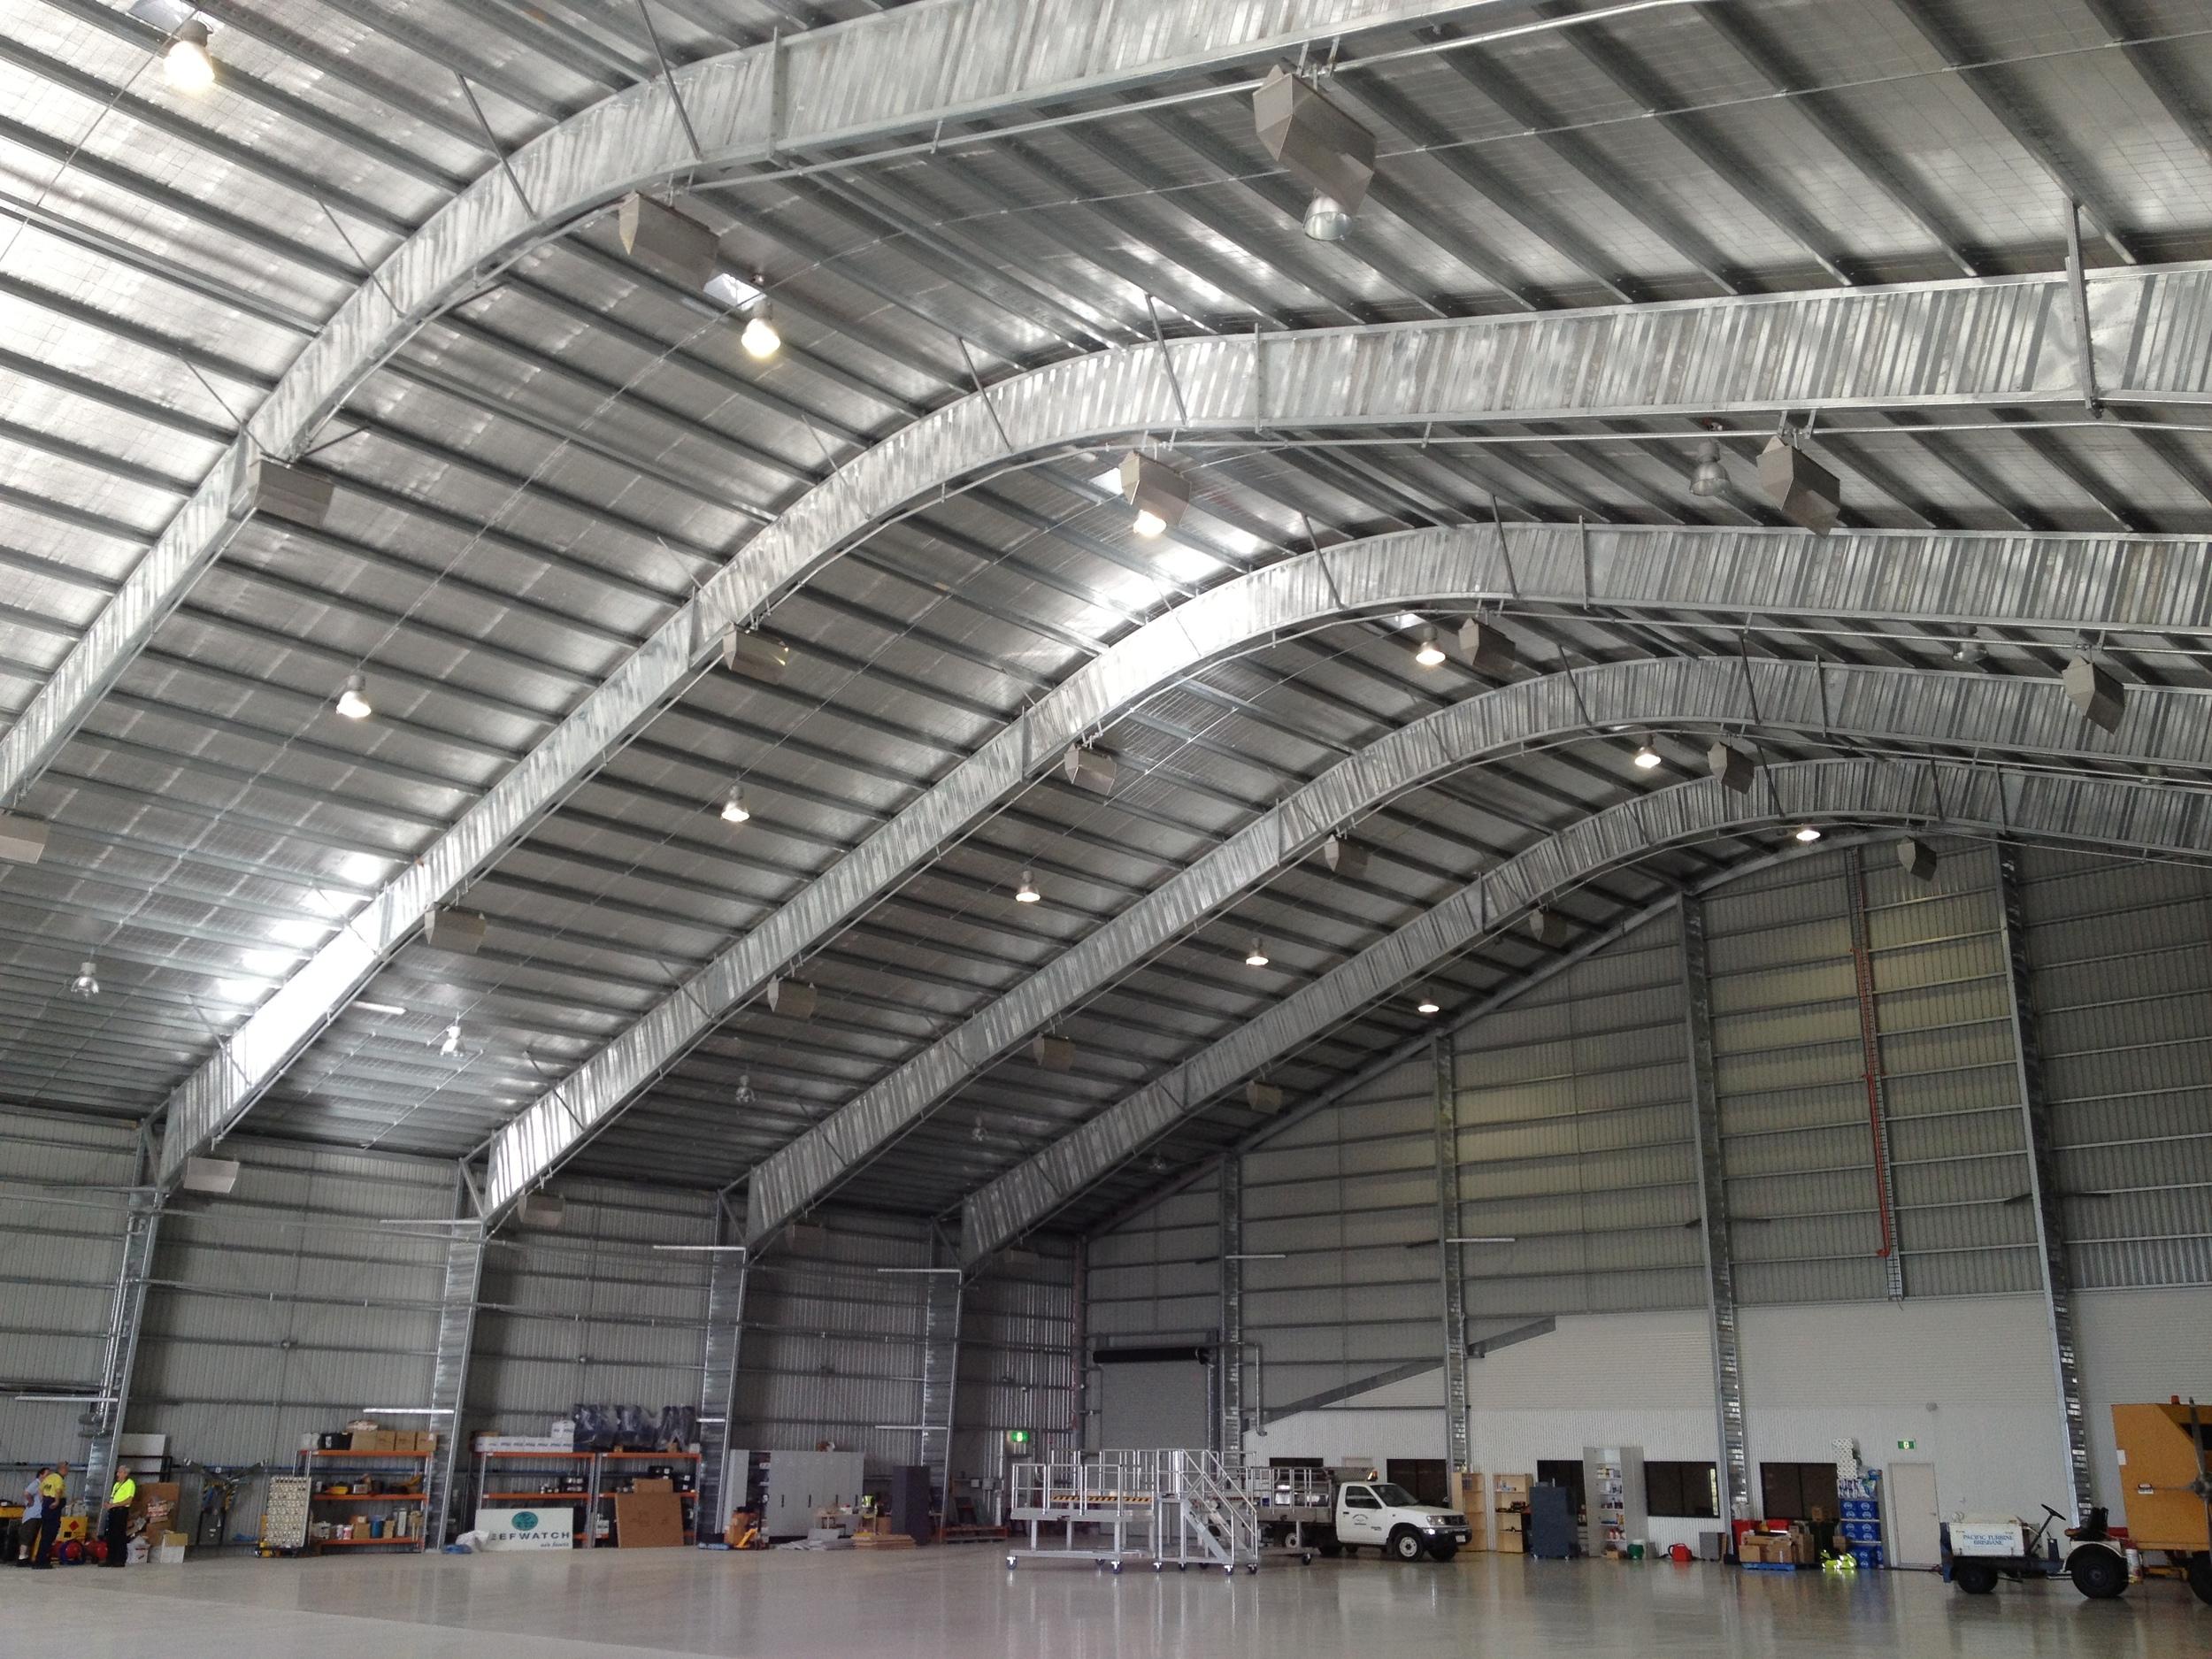 Inside Hangar.JPG